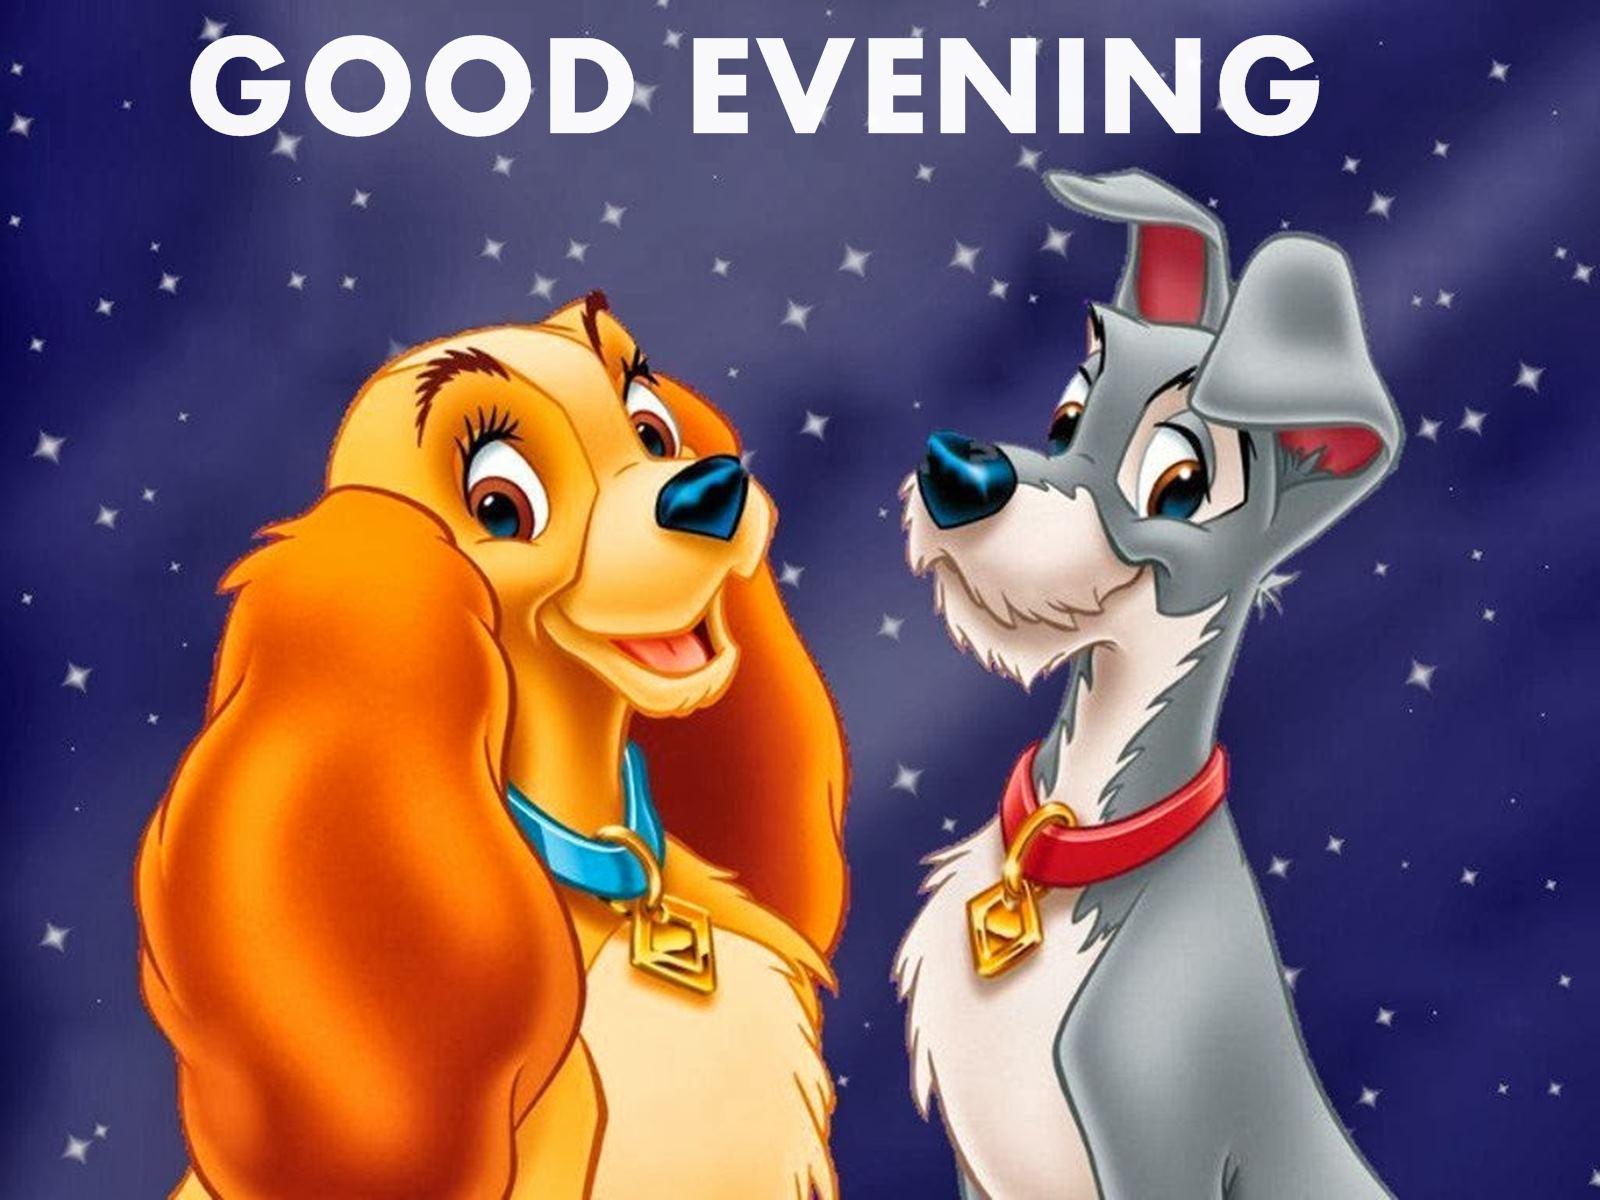 Good Evening Disney Cartoon Wallpaper Good Evening Images Cartoon 909319 Hd Wallpaper Backgrounds Download